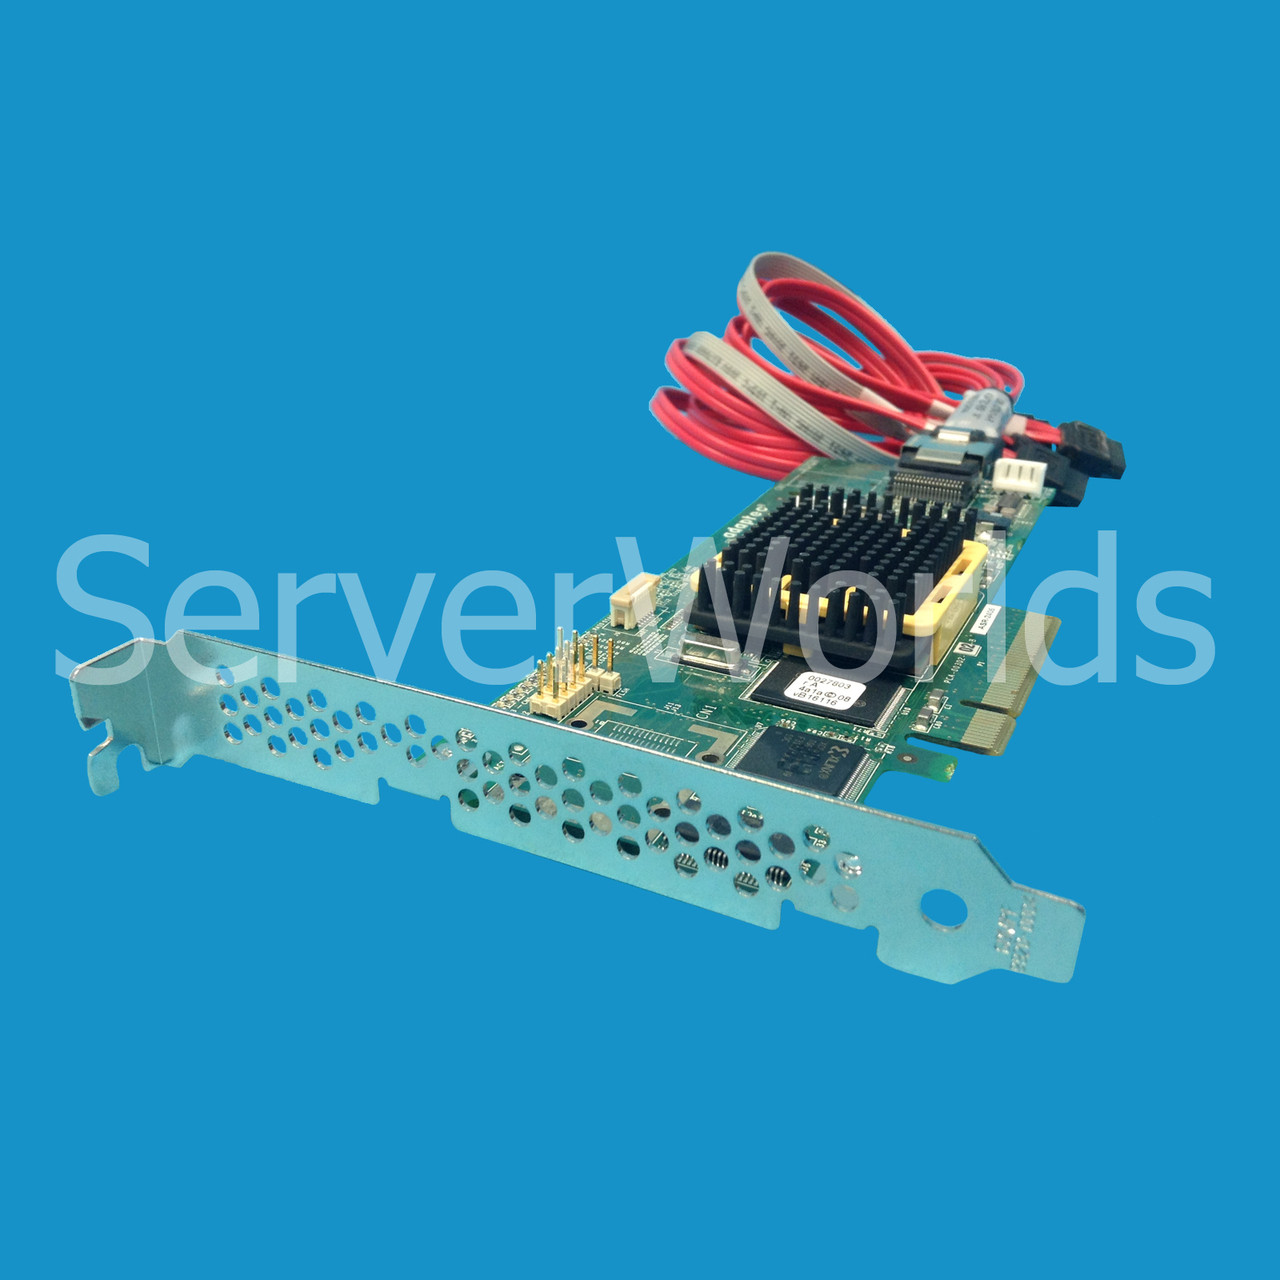 Adaptec ASR-2405 | 2405 PCIe Raid Controller - Serverworlds